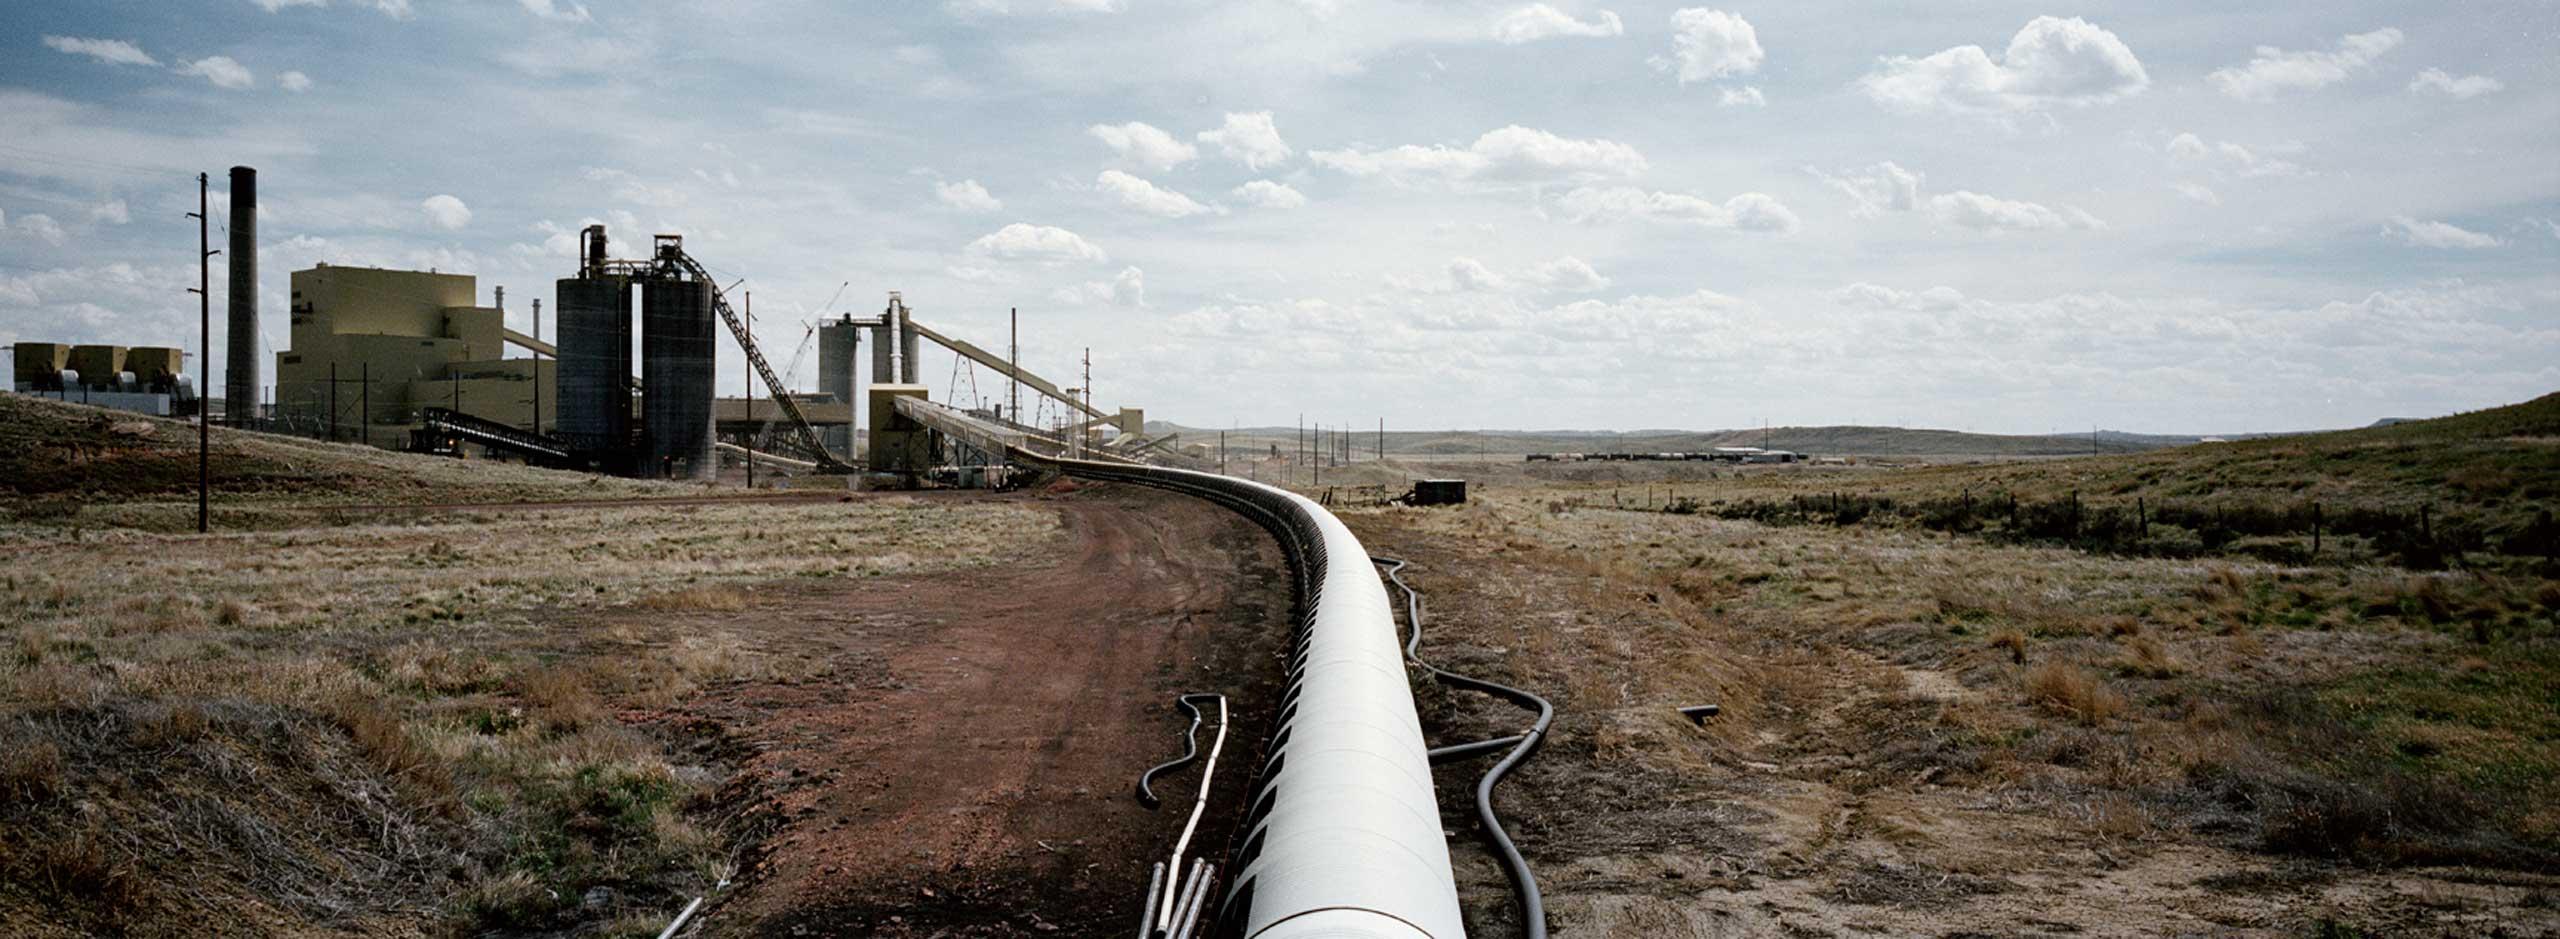 Power plant, Wyoming, 2014